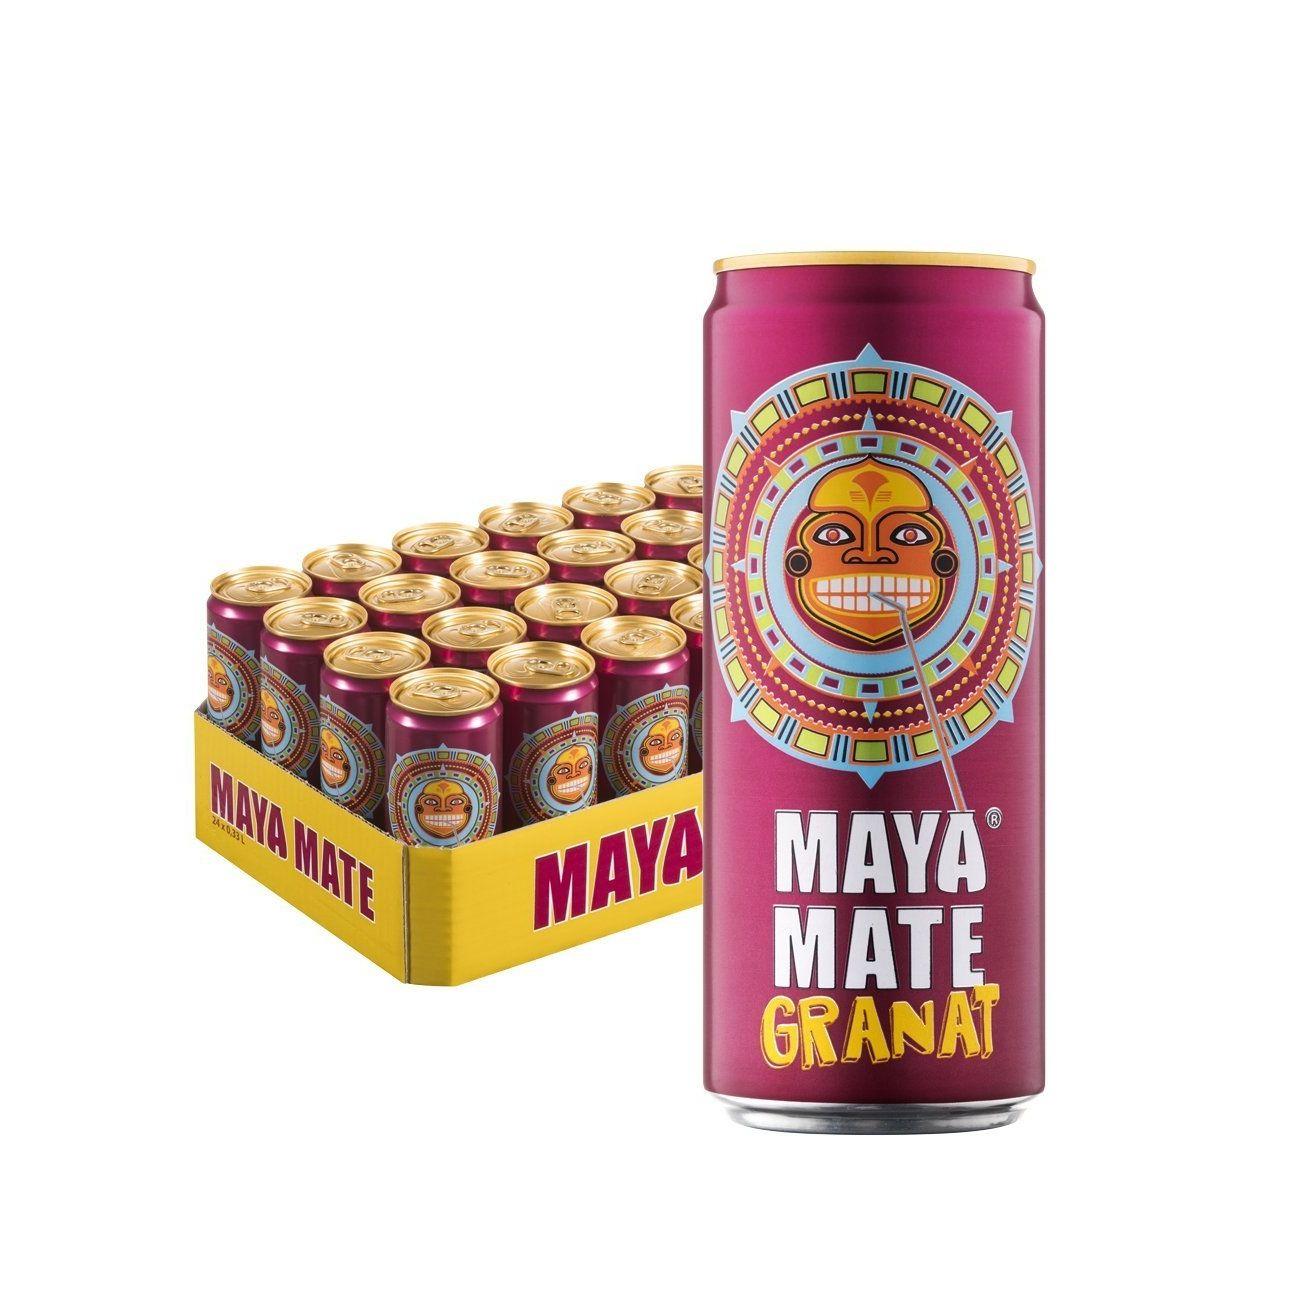 ABGELAUFEN [AMAZON Prime] Maya Mate Granat Dosen zzgl. 6€ Pfand (24x 0,33l)